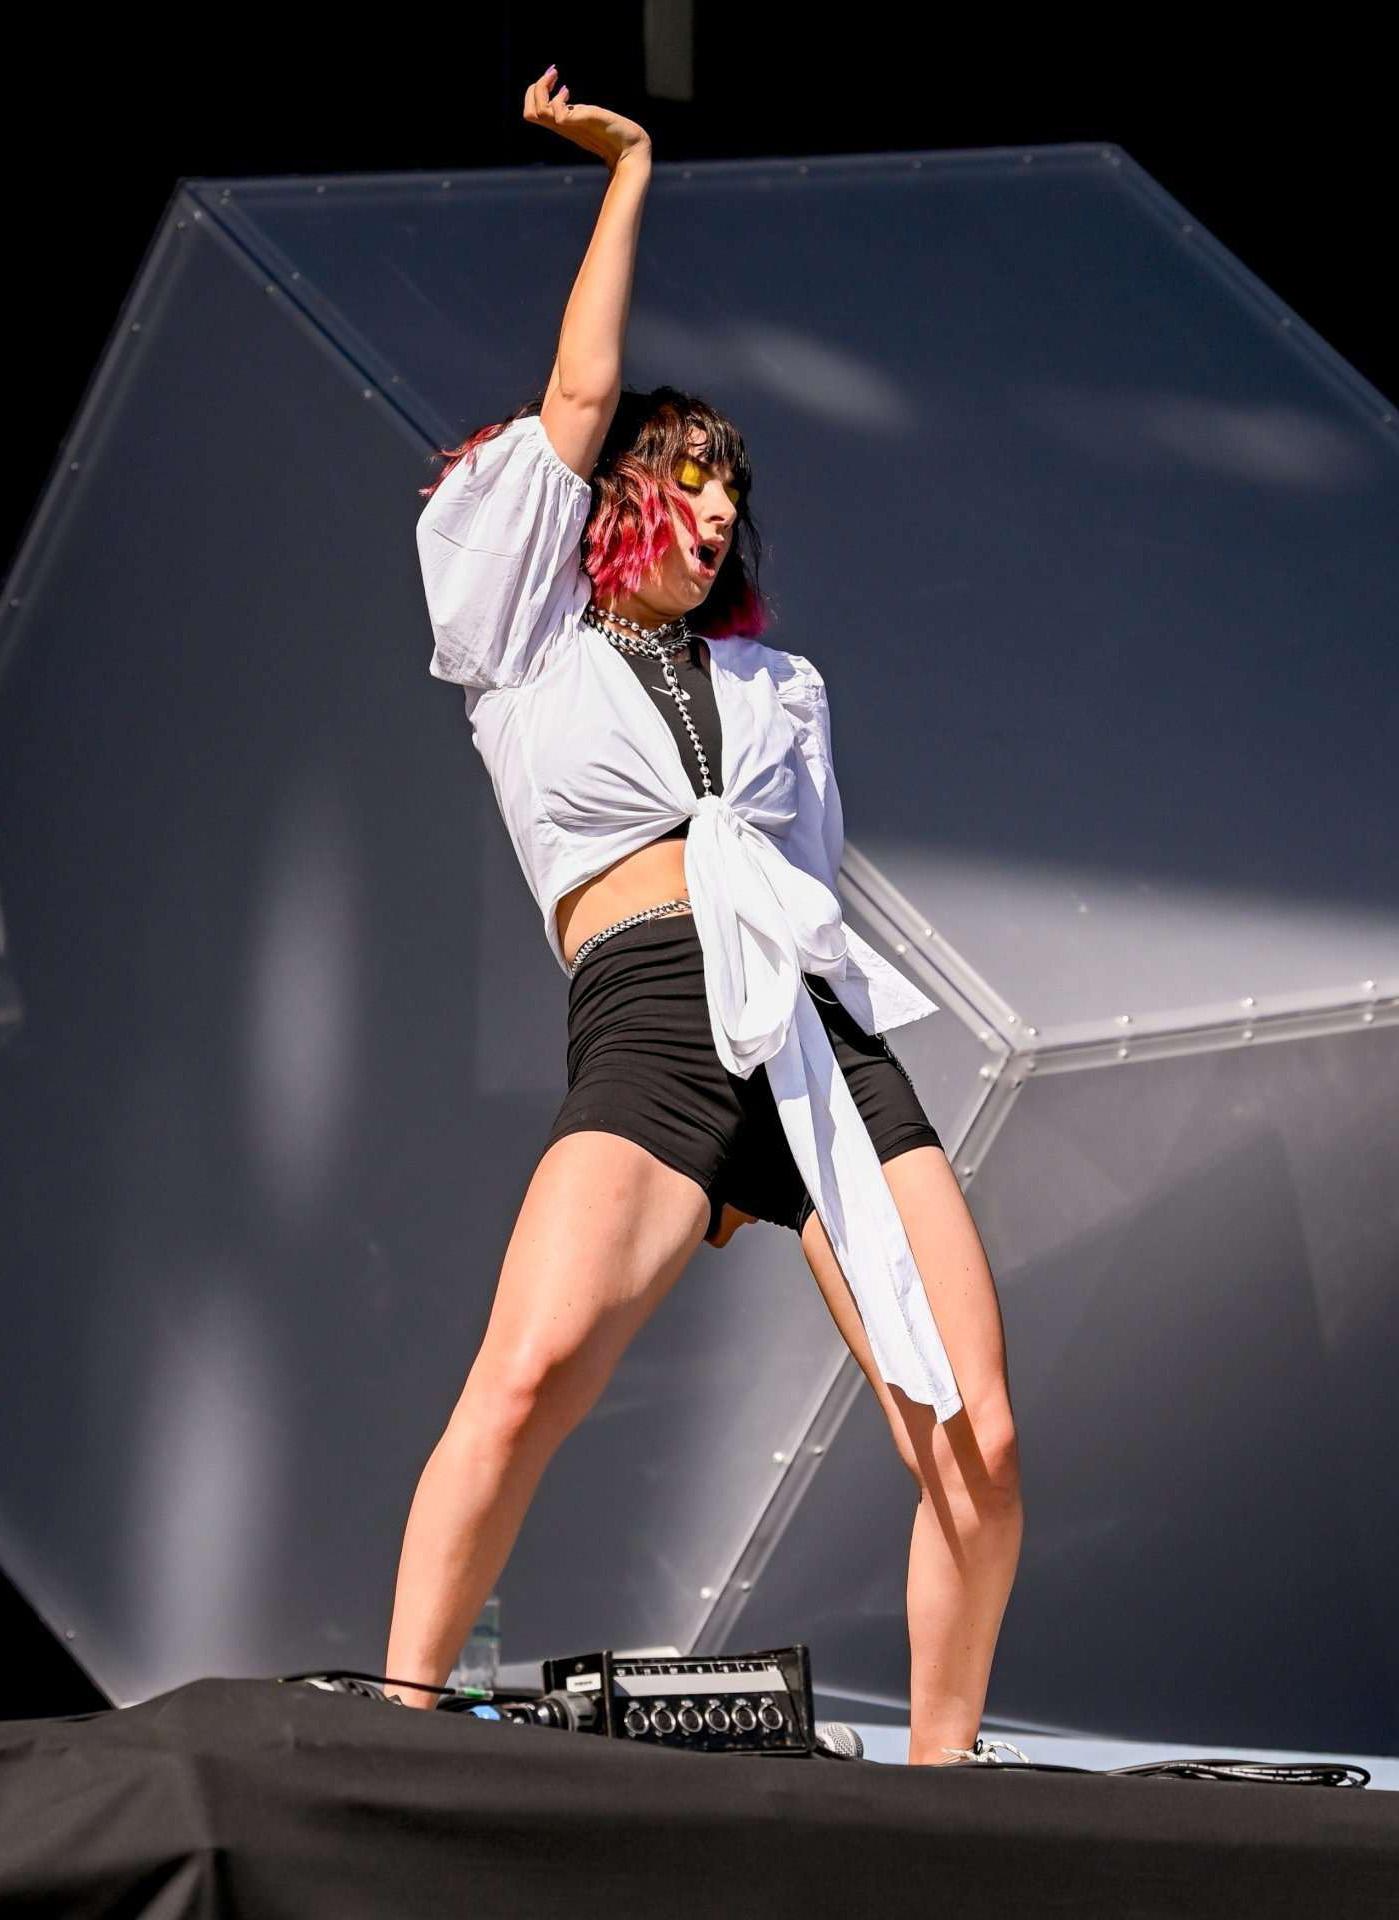 Шарлотта Эмма Эйтчисон на сцене рок фестиваля